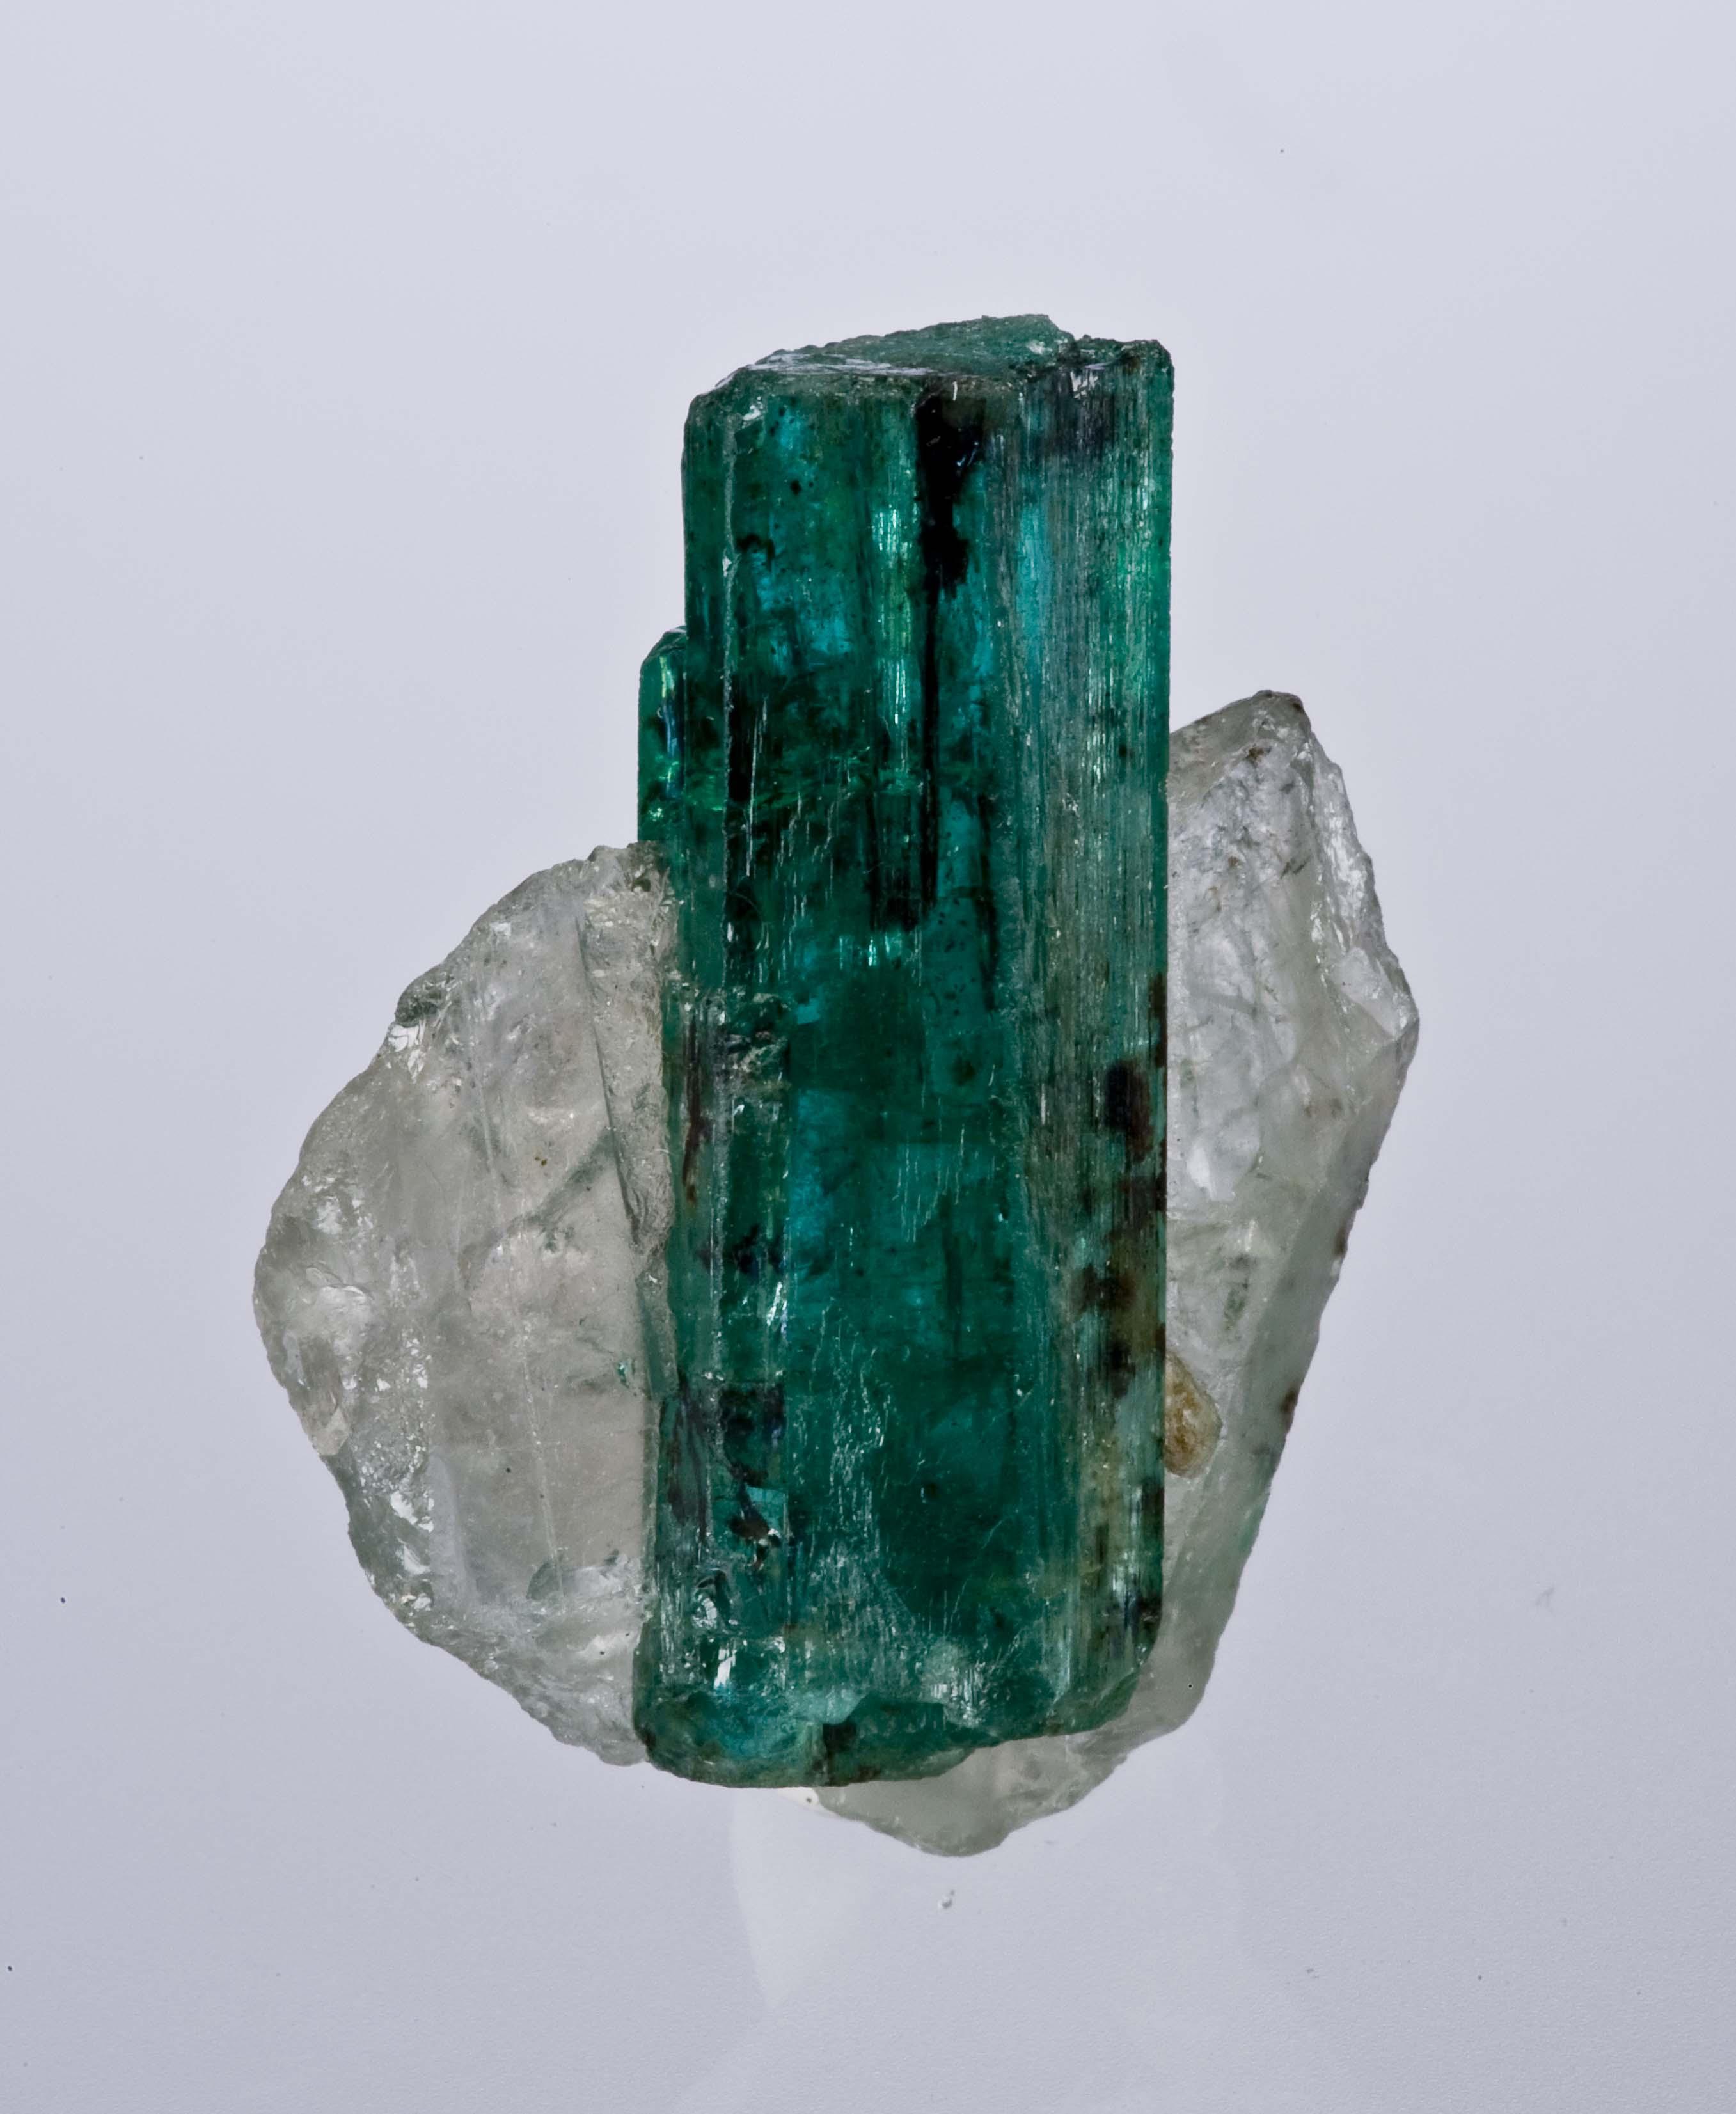 File:Beryl-Quartz-Emerald-Zambia-37mm 0882.jpg